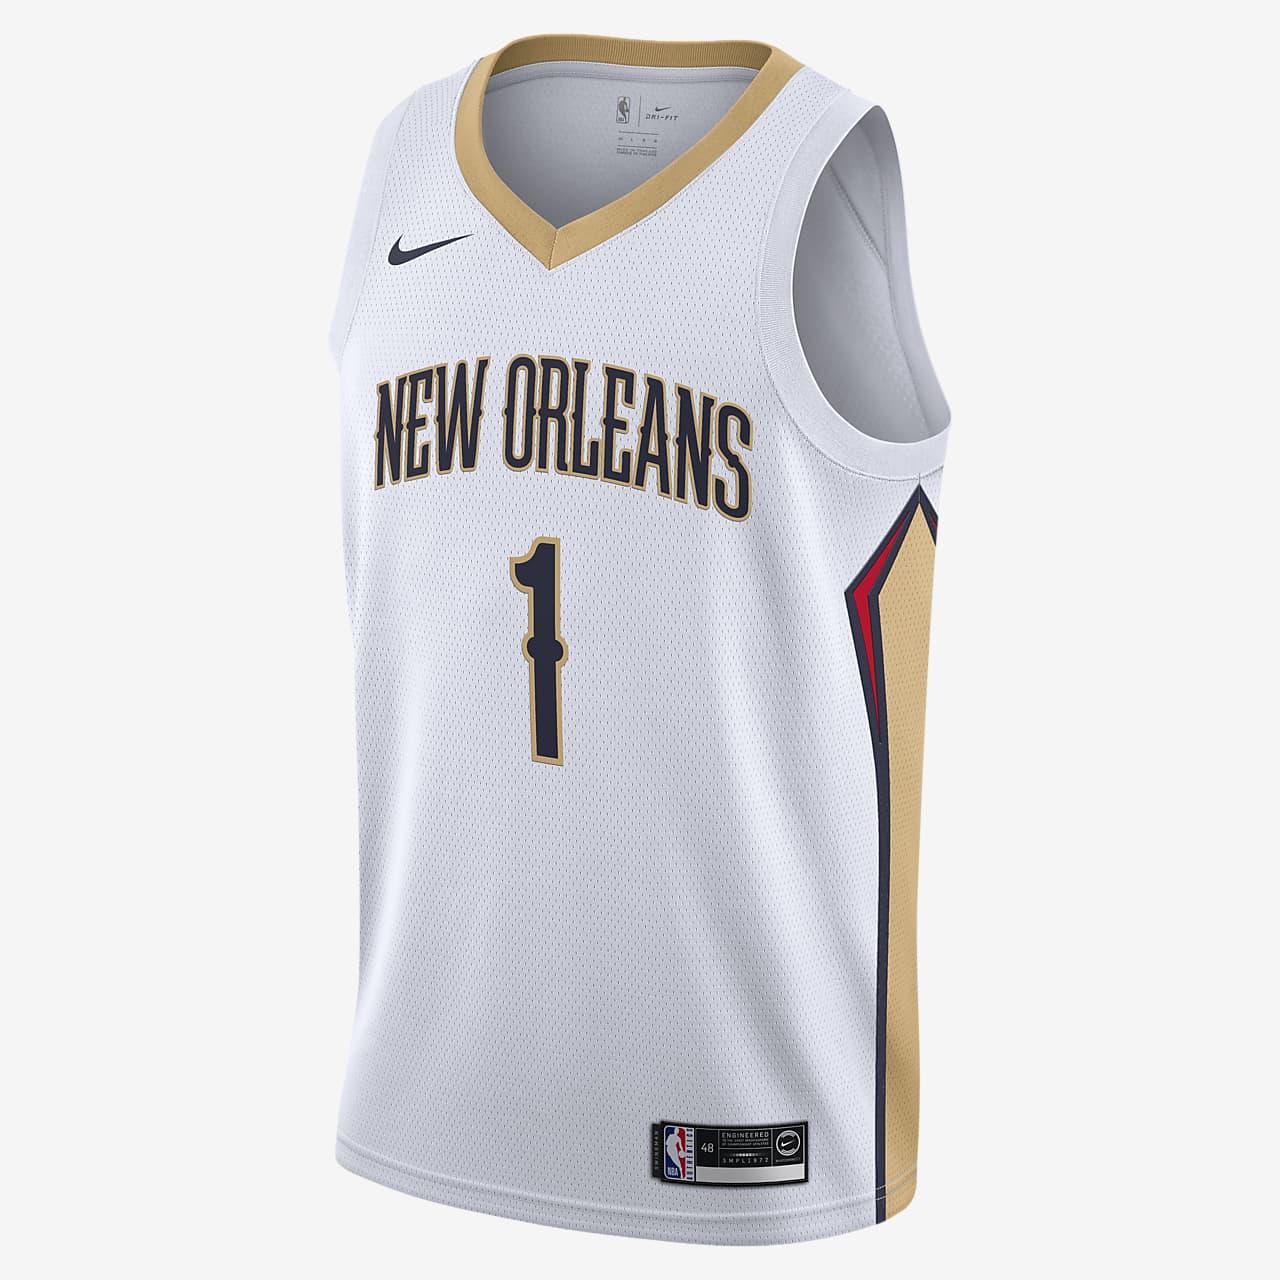 新奥尔良鹈鹕队 (Zion Williamson) Association Edition Nike NBA Jersey 男子球衣